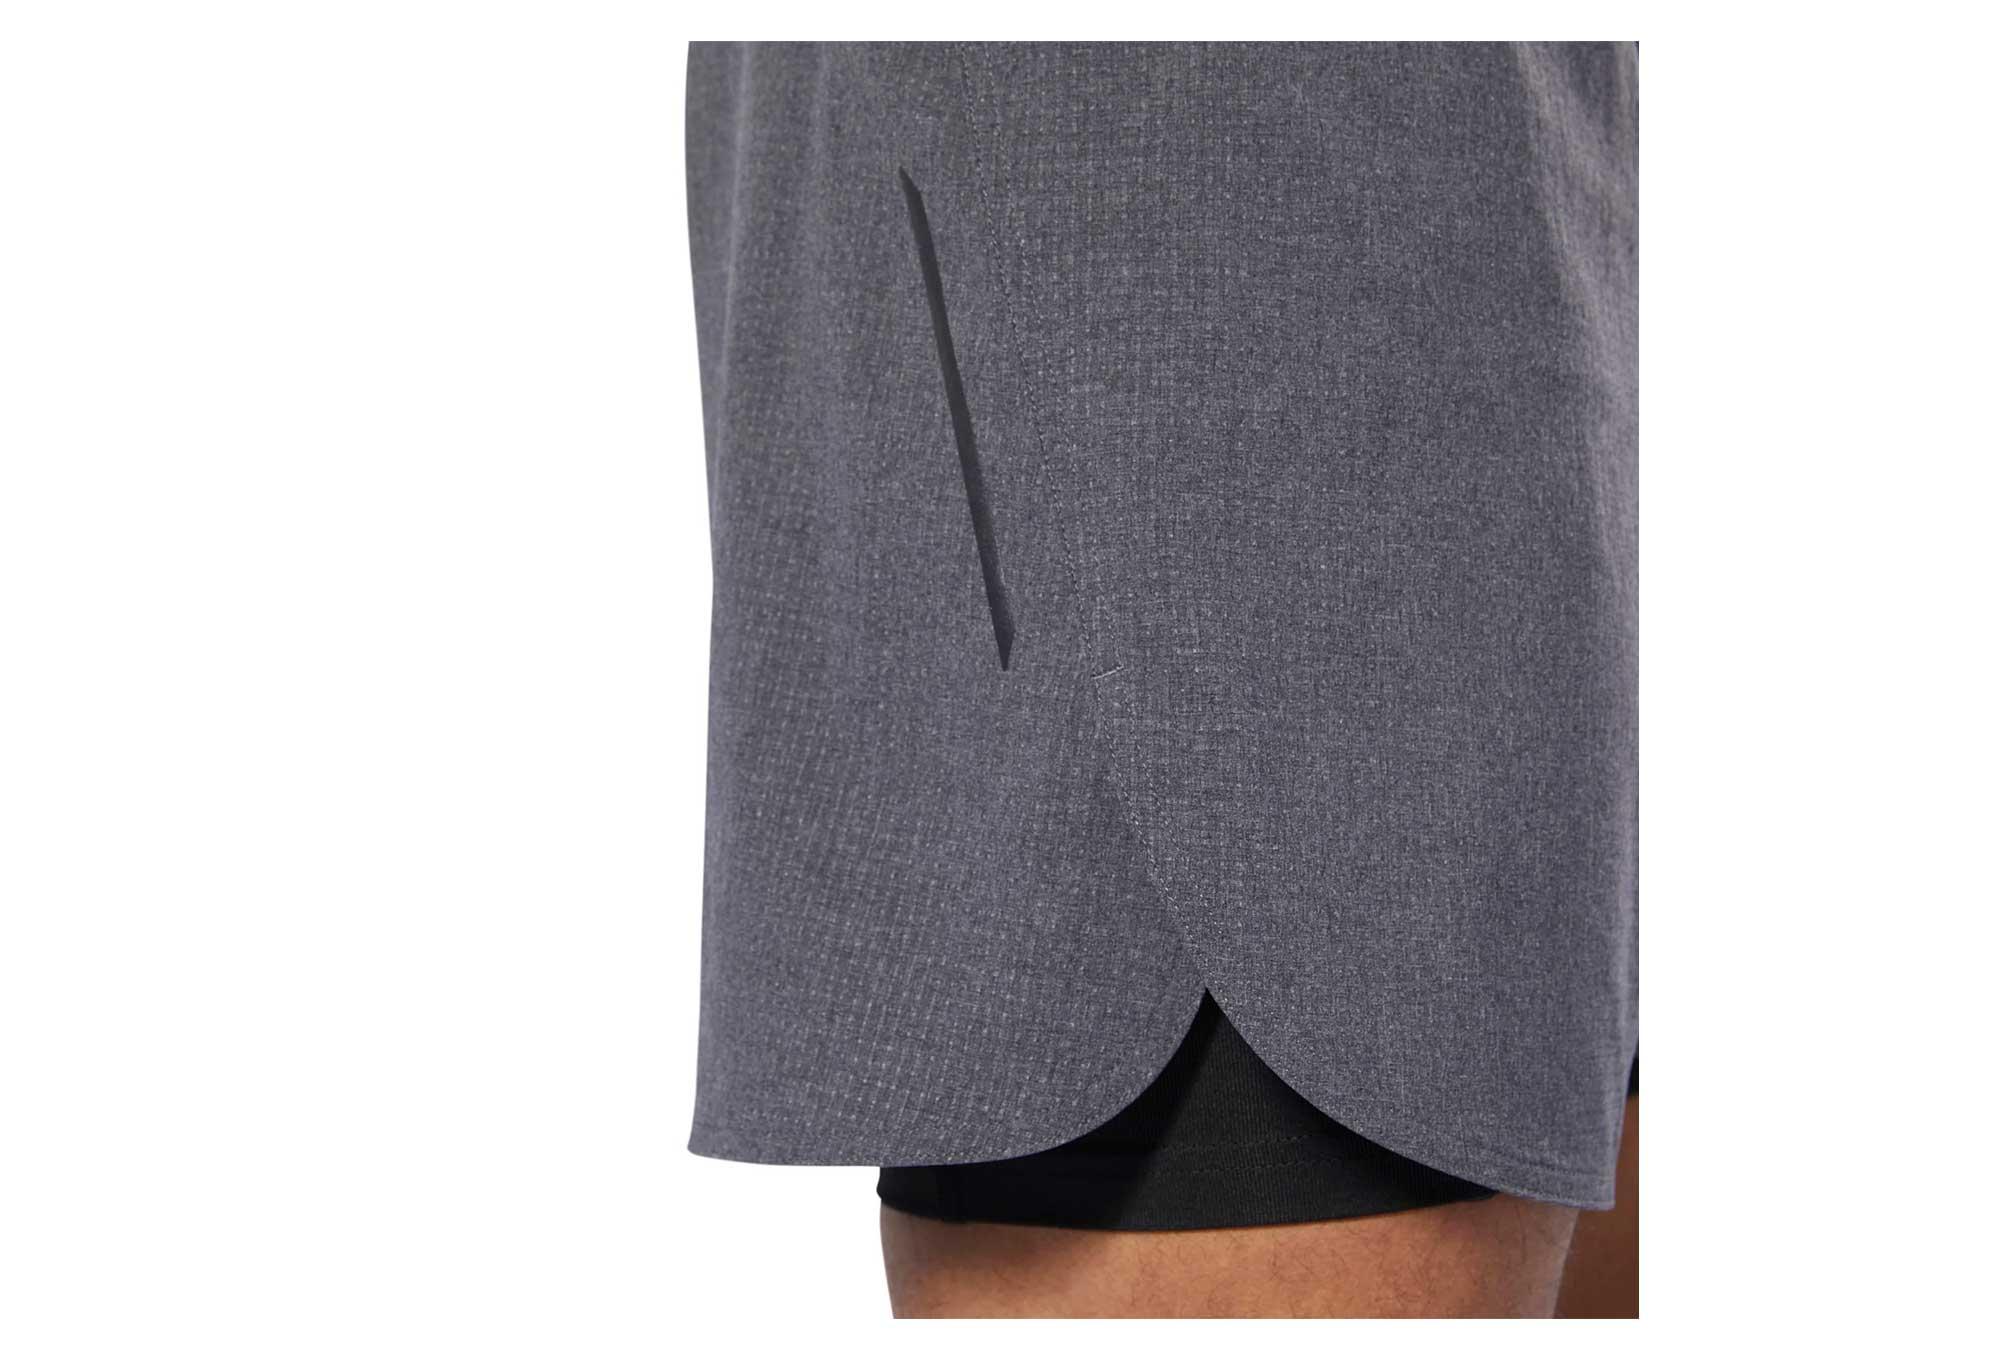 67acbac1 Reebok One Series Running Epic 2-in-1 Shorts Grey